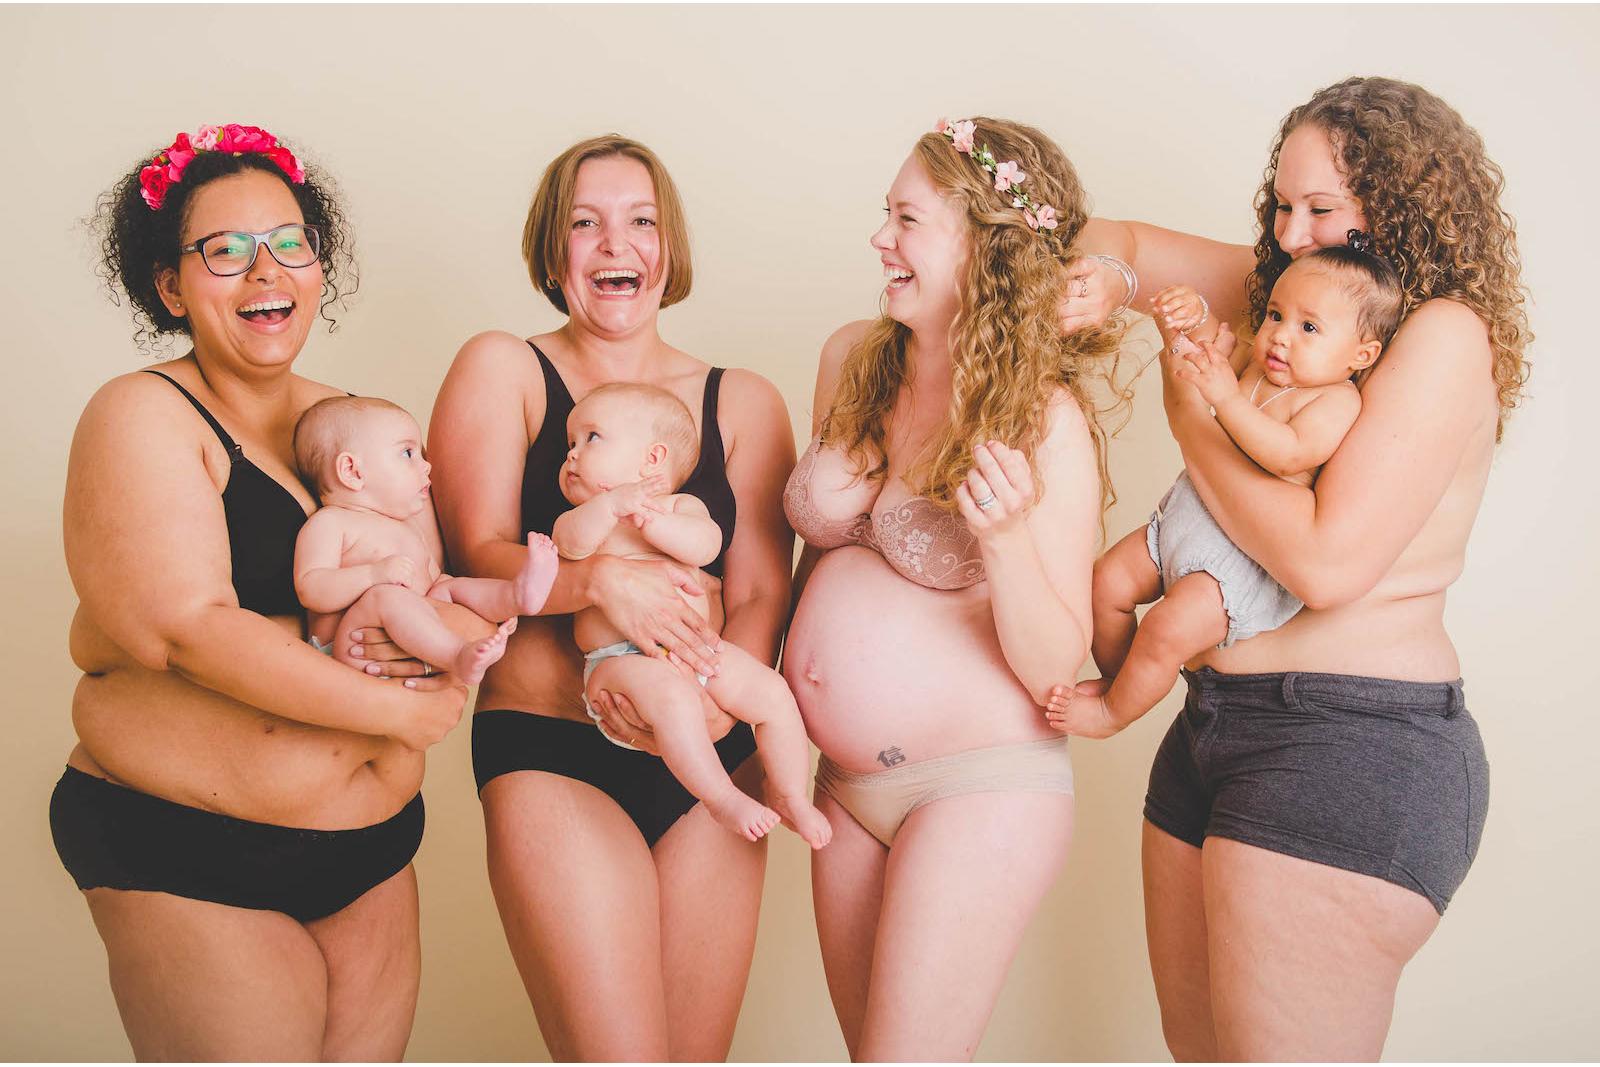 16 Honest Photos Show A Full Spectrum Of Post-Baby Bodies